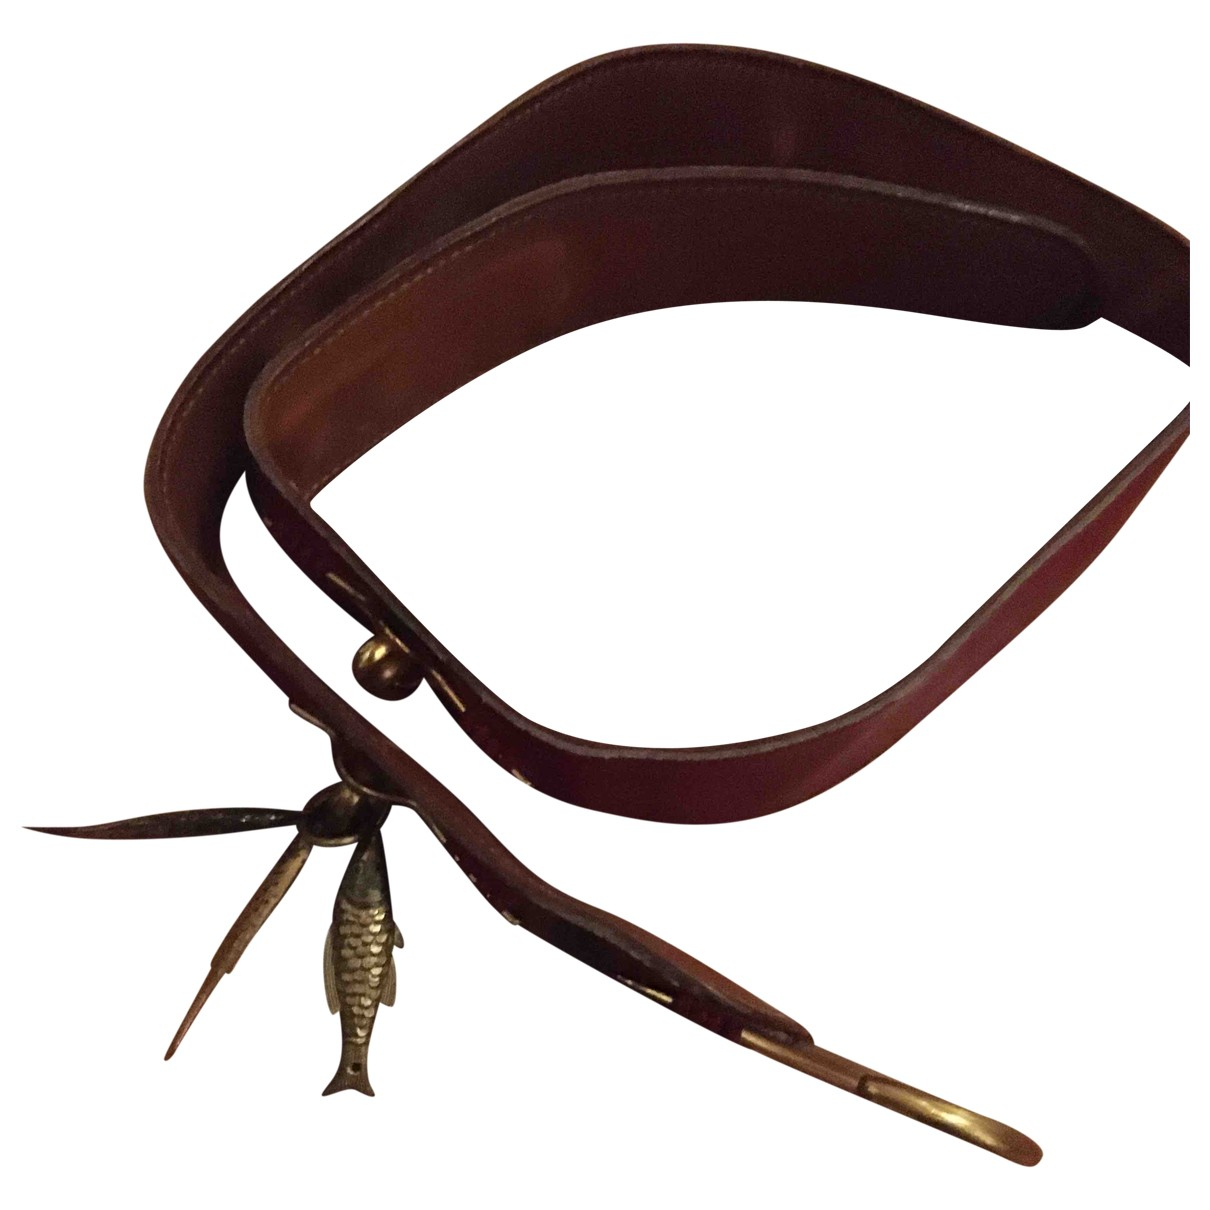 Cinturon Cuir seul / Leather Strap Hermes